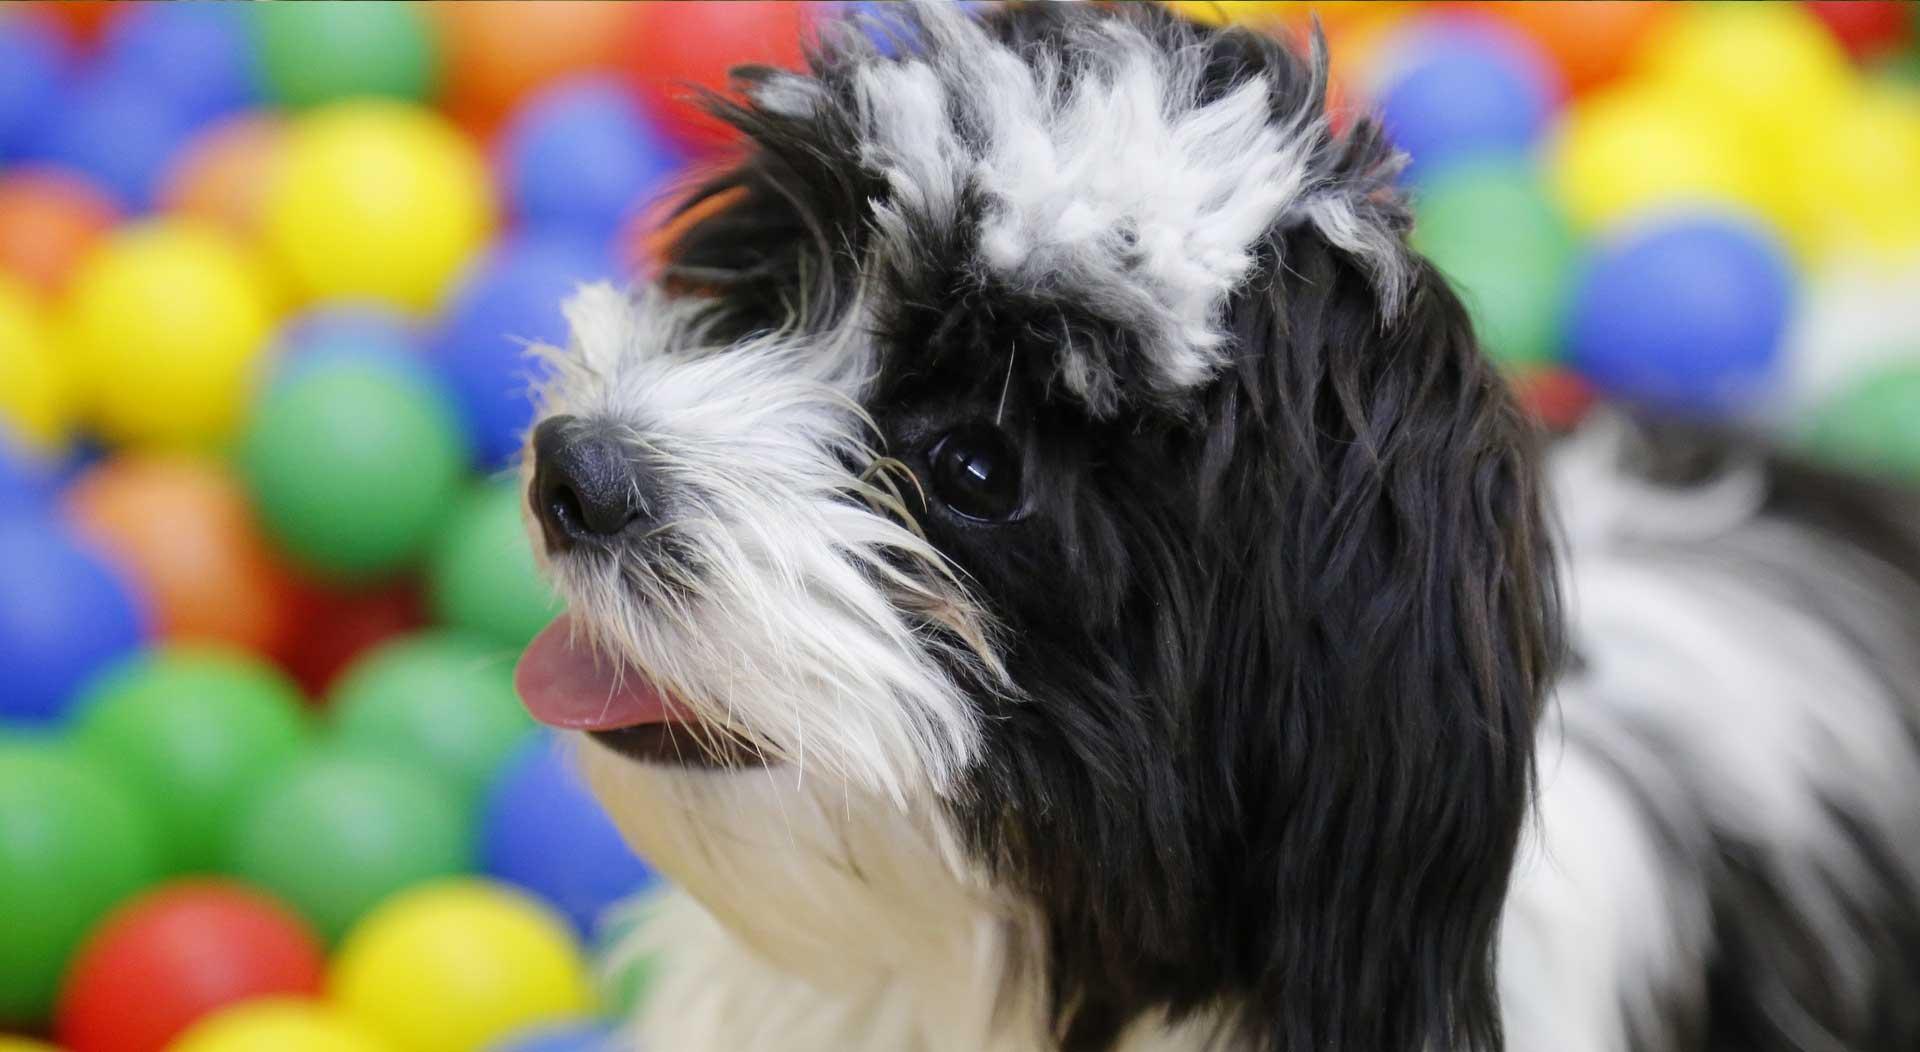 Dog daycare in Windsor